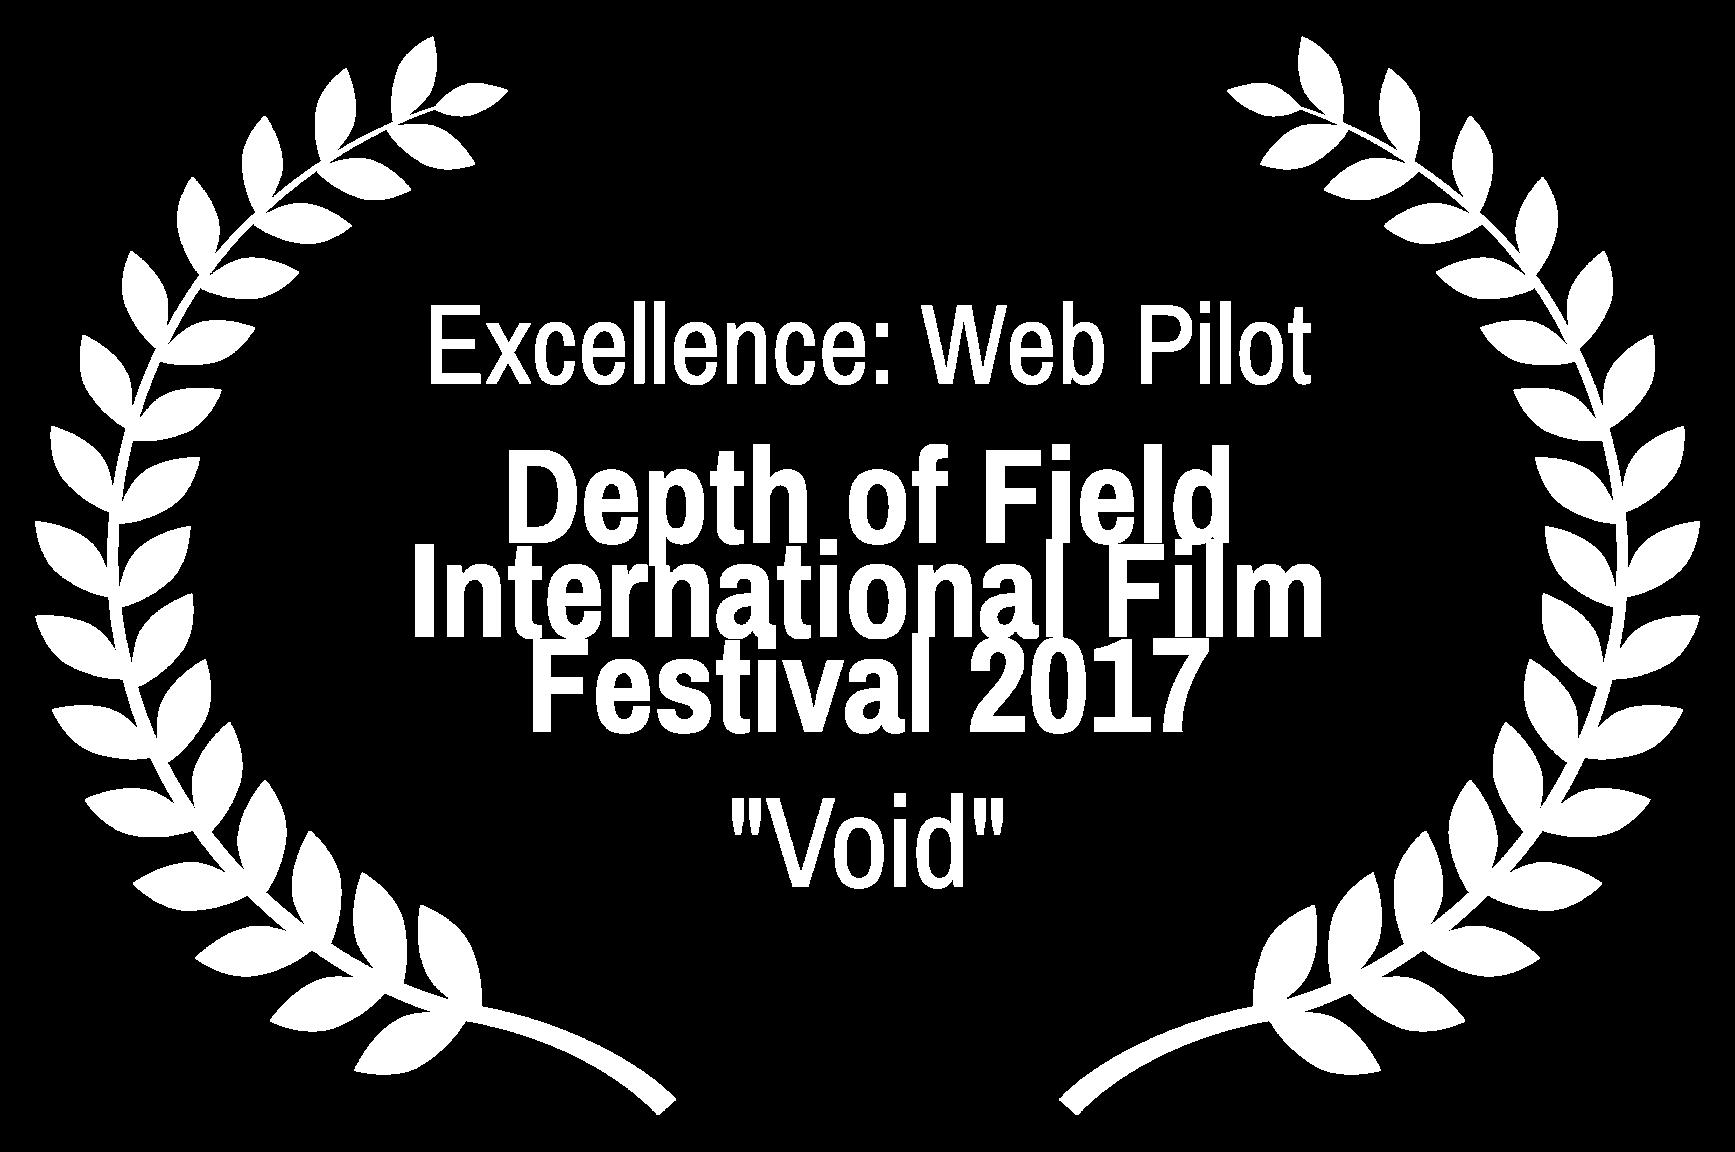 Excellence Web Pilot - Depth of Field International Film Festival 2017 - Void.png